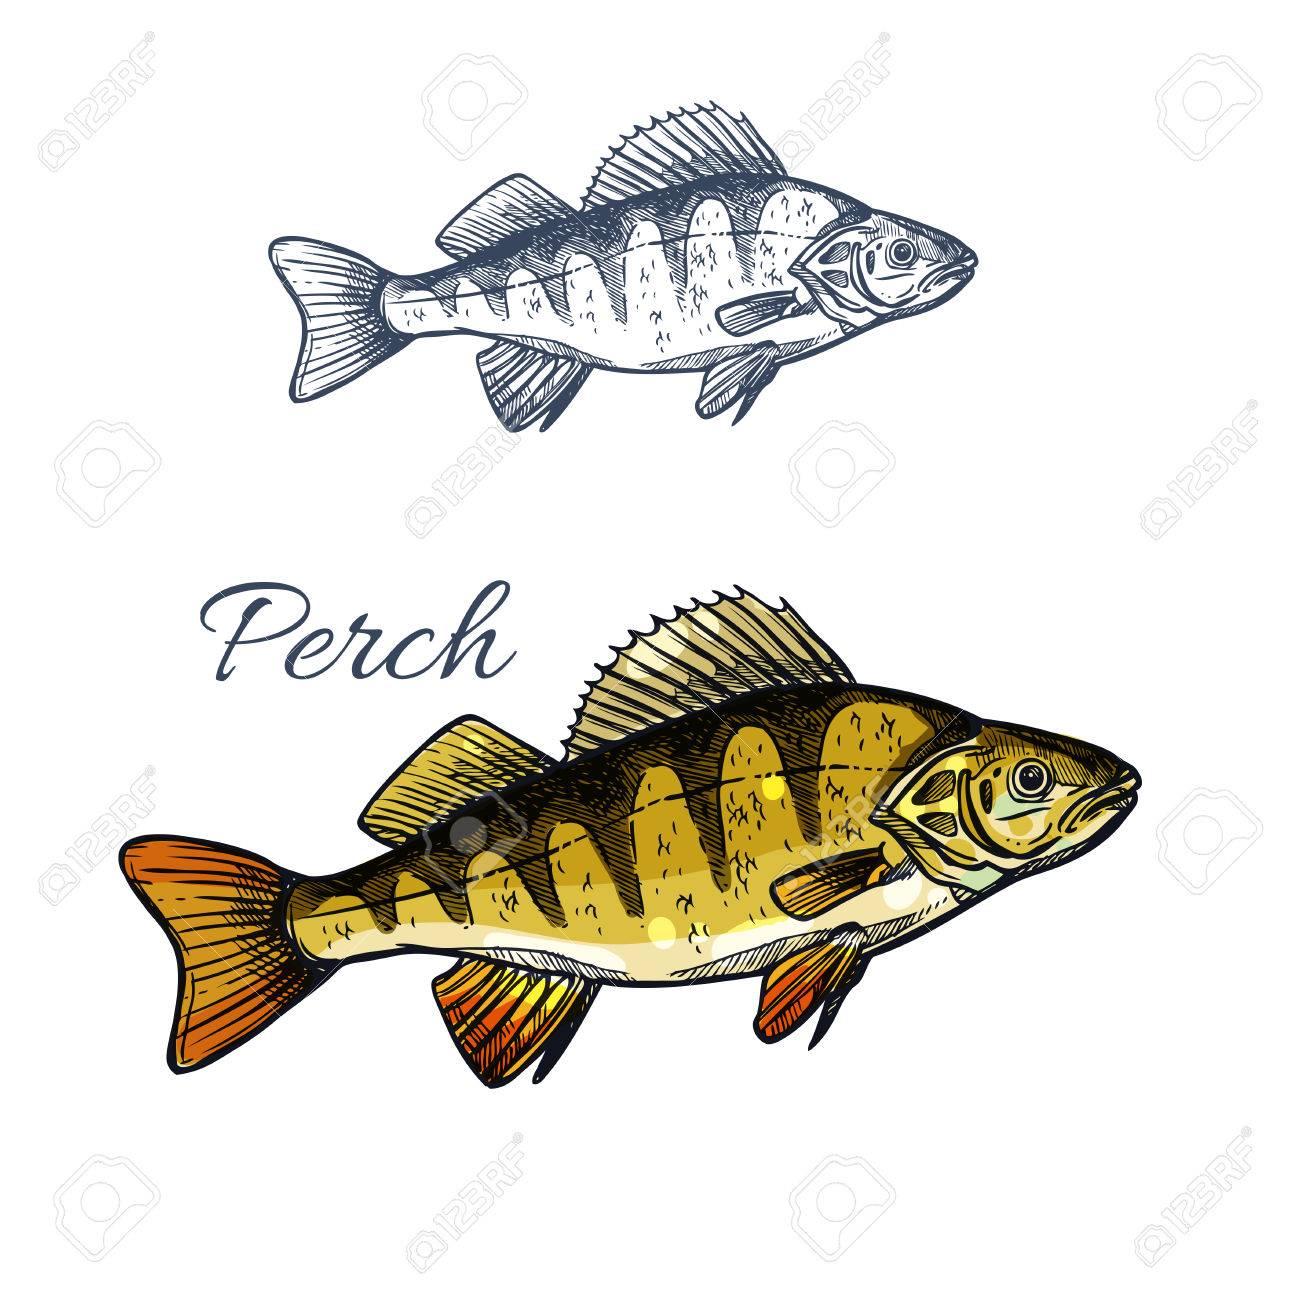 perch fish isolated sketch of freshwater predator royalty fri rh se 123rf com Perch Fish Clip Art Quality Pencil Drawings of Bass Fish